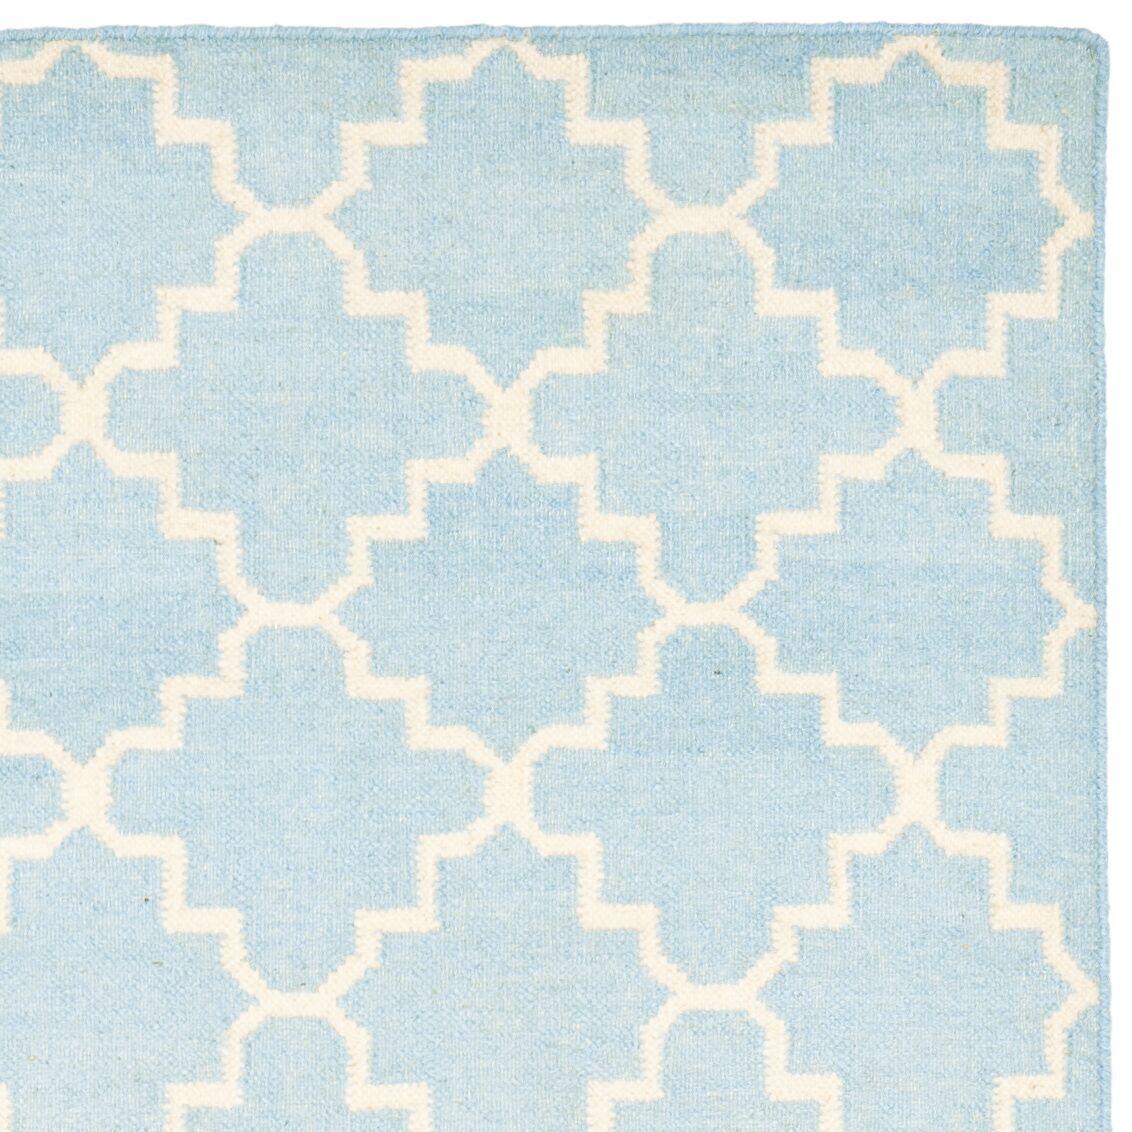 Danbury Hand-Woven Wool Light Blue/Ivory Area Rug Rug Size: Rectangle 10' x 14'